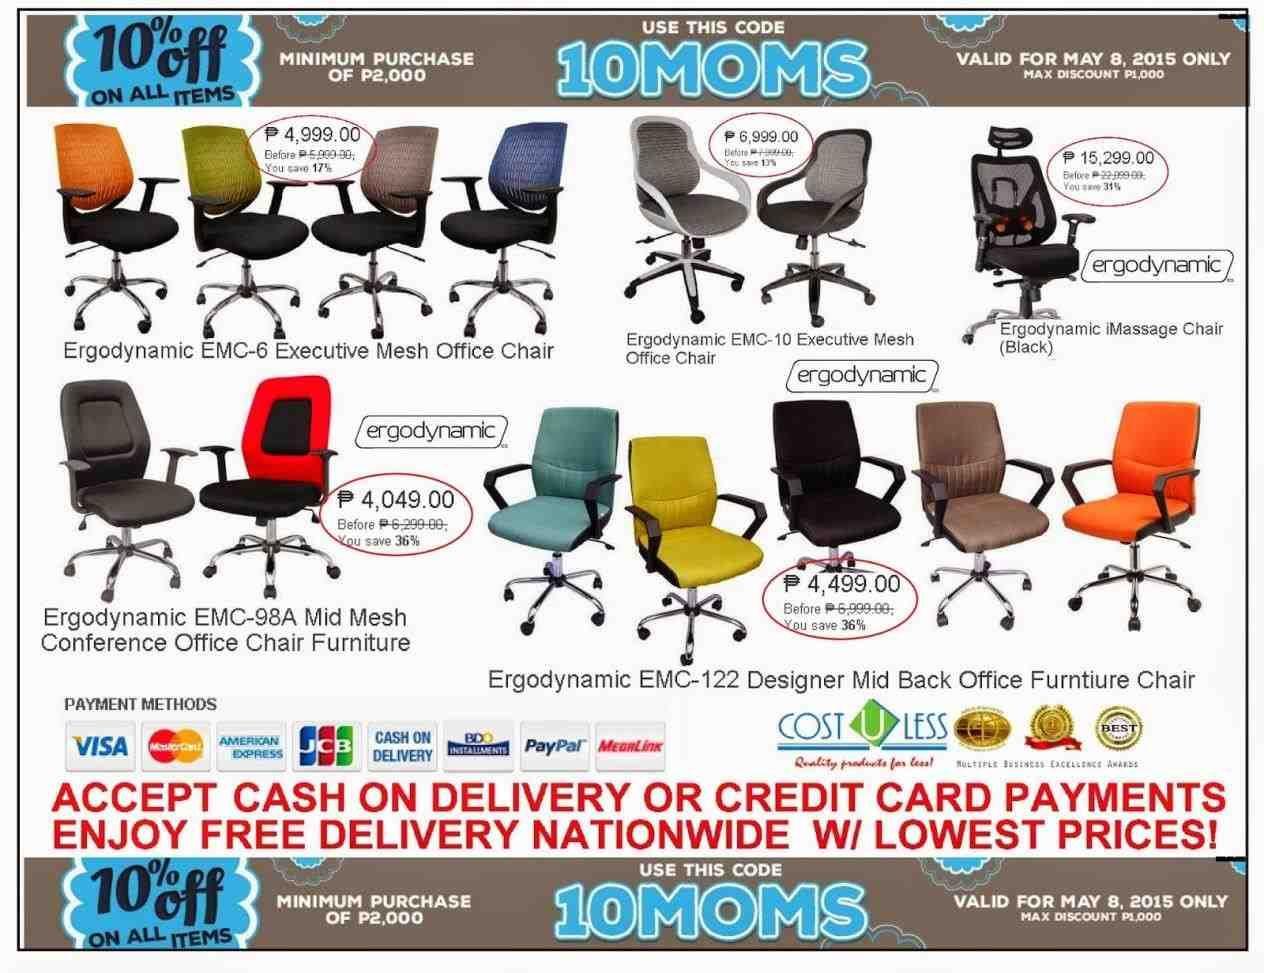 Pleasing Cheap Office Chairs For Sale Philippines Office Desk Full Interior Design Ideas Truasarkarijobsexamcom